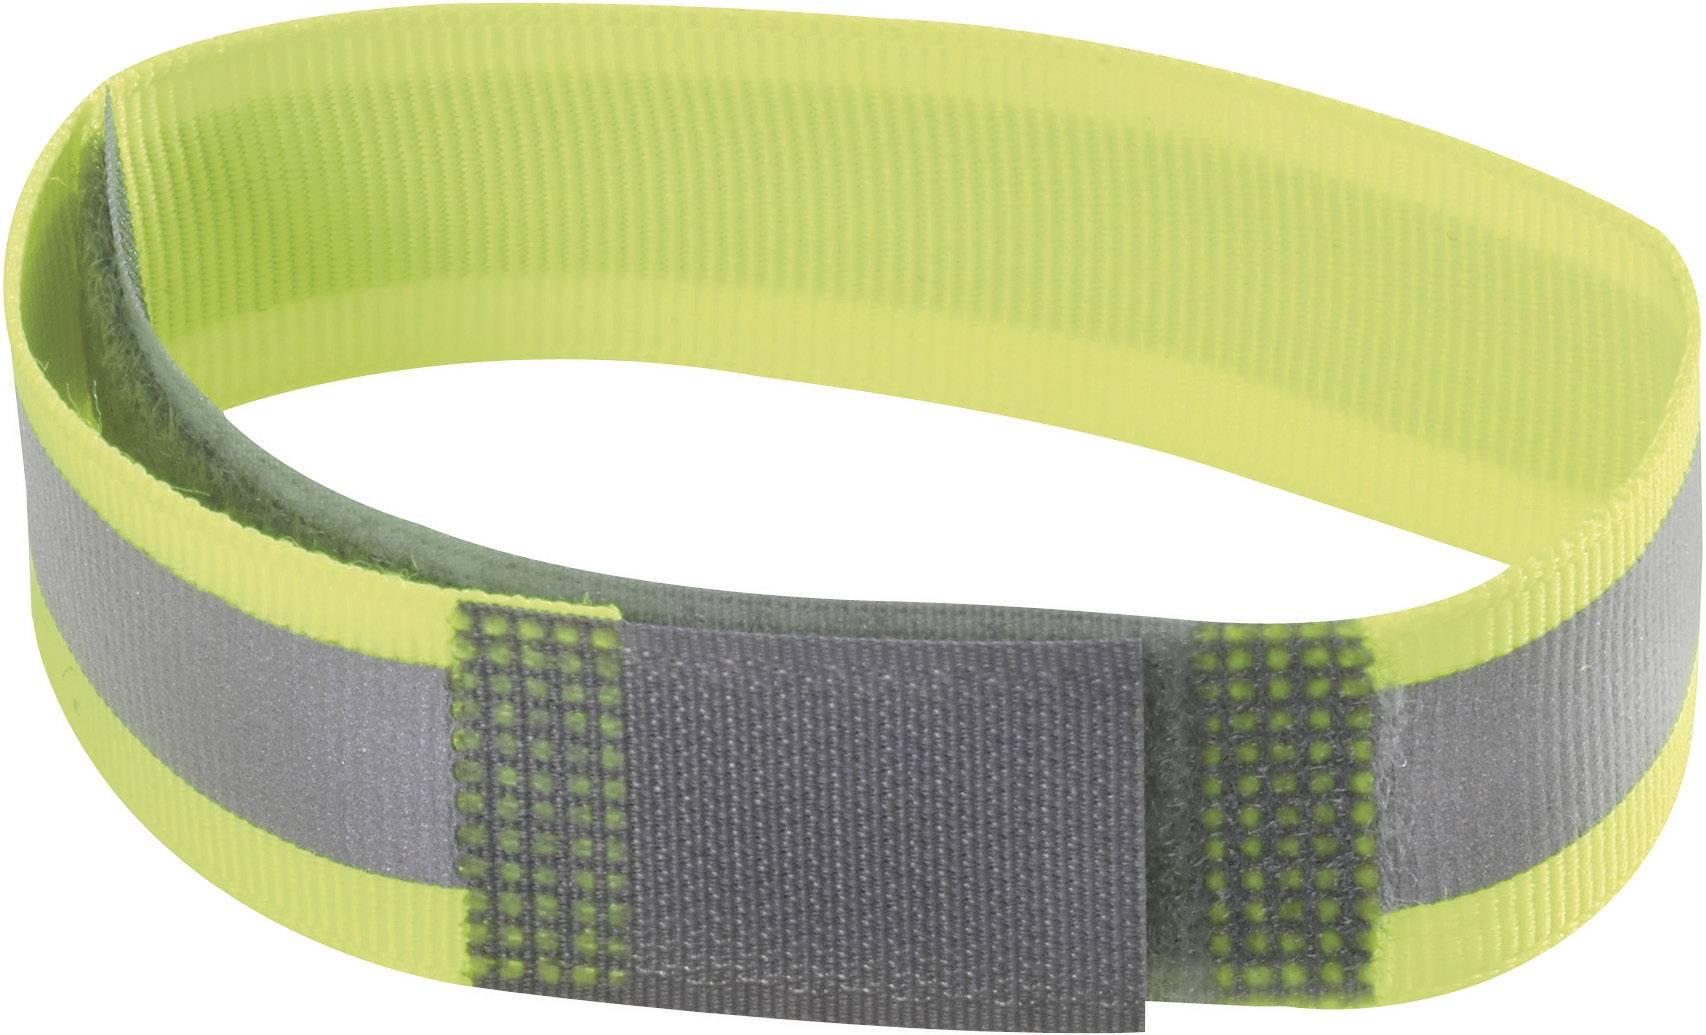 Pásik so suchým zipsom Fastech F102-25-380R, (d x š) 380 mm x 25 mm, žltá (fluorescenčná), 1 ks